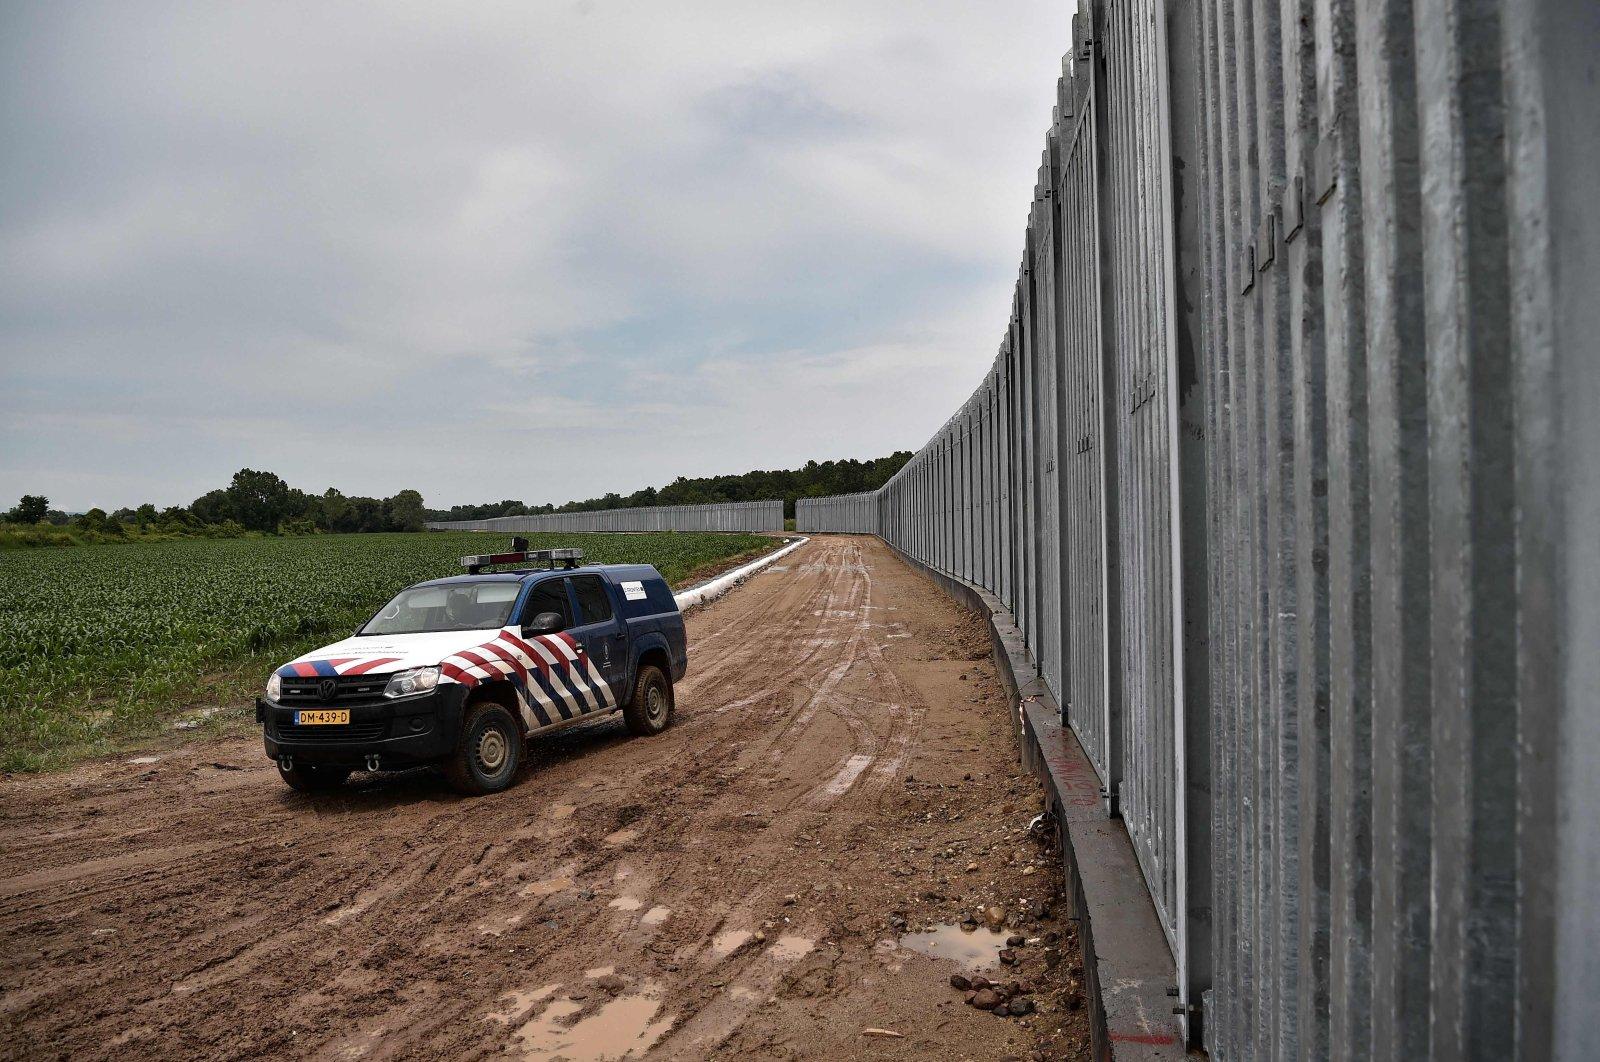 A Frontex car patrols a steel fence along the Maritsa (Meriç) River, Greece's river border with Turkey, near the village of Poros, June 8, 2021. (AFP Photo)